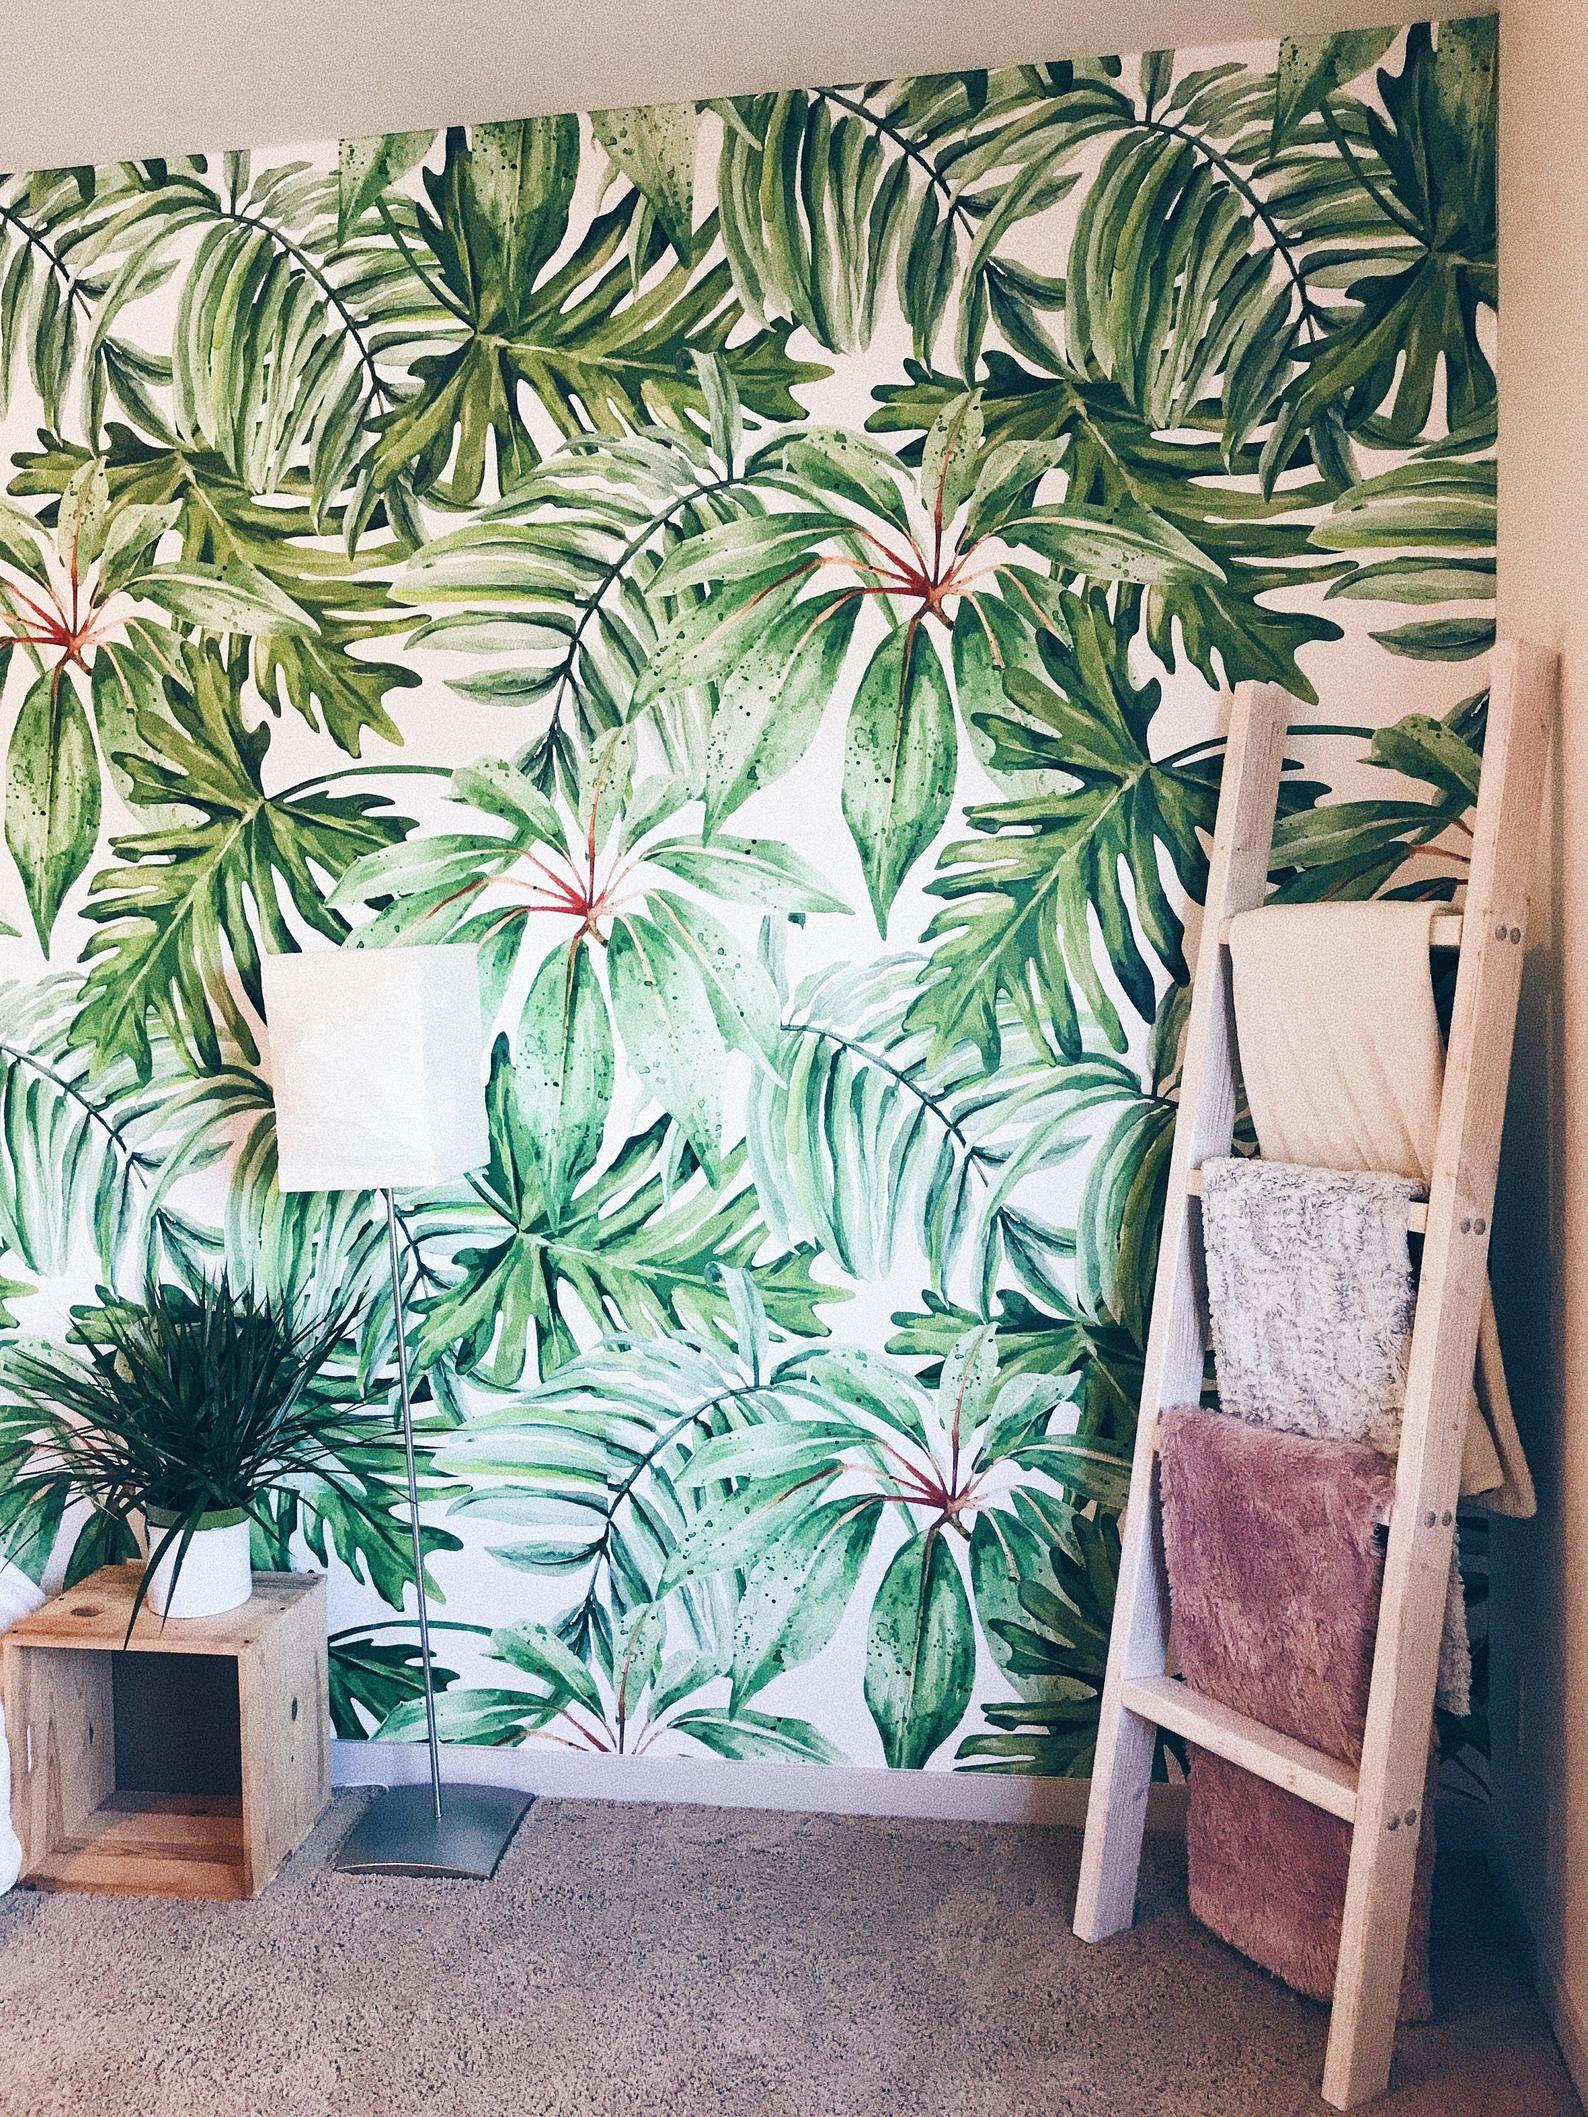 Light Banana Leaves Removable Wallpaper Banana Leaf Etsy In 2021 Wallpaper Watercolor Walls Mural